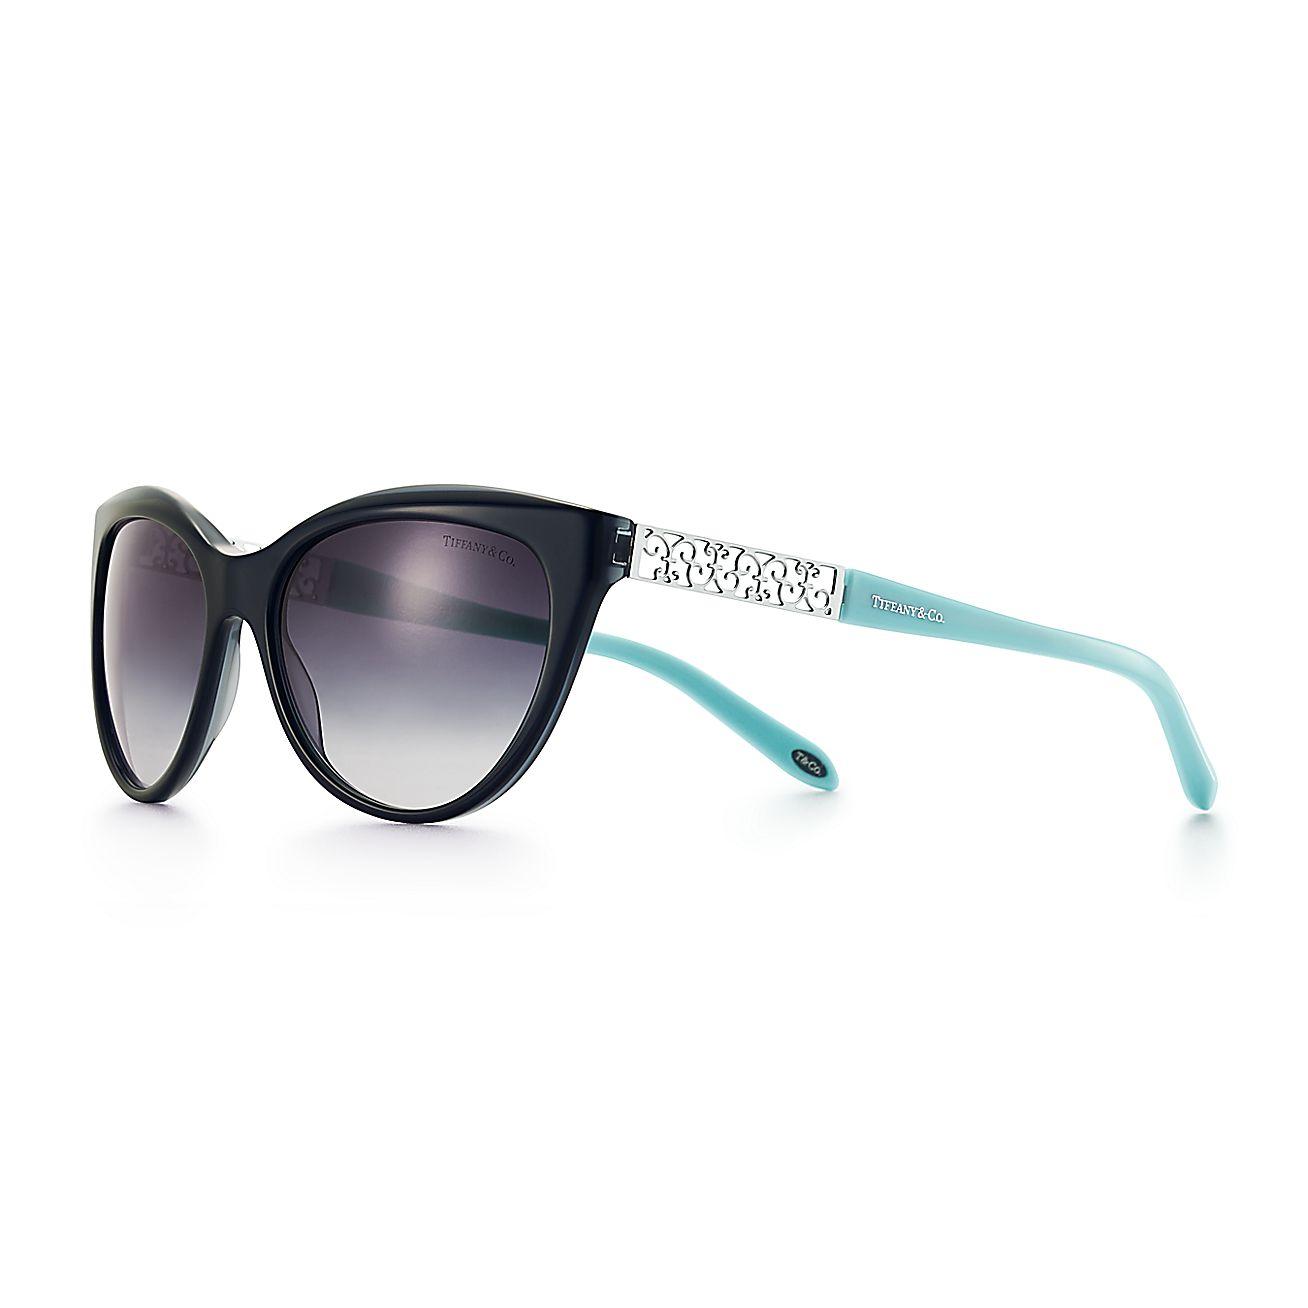 88ad8eb772e3 Tiffany Sunglasses Cat Eye